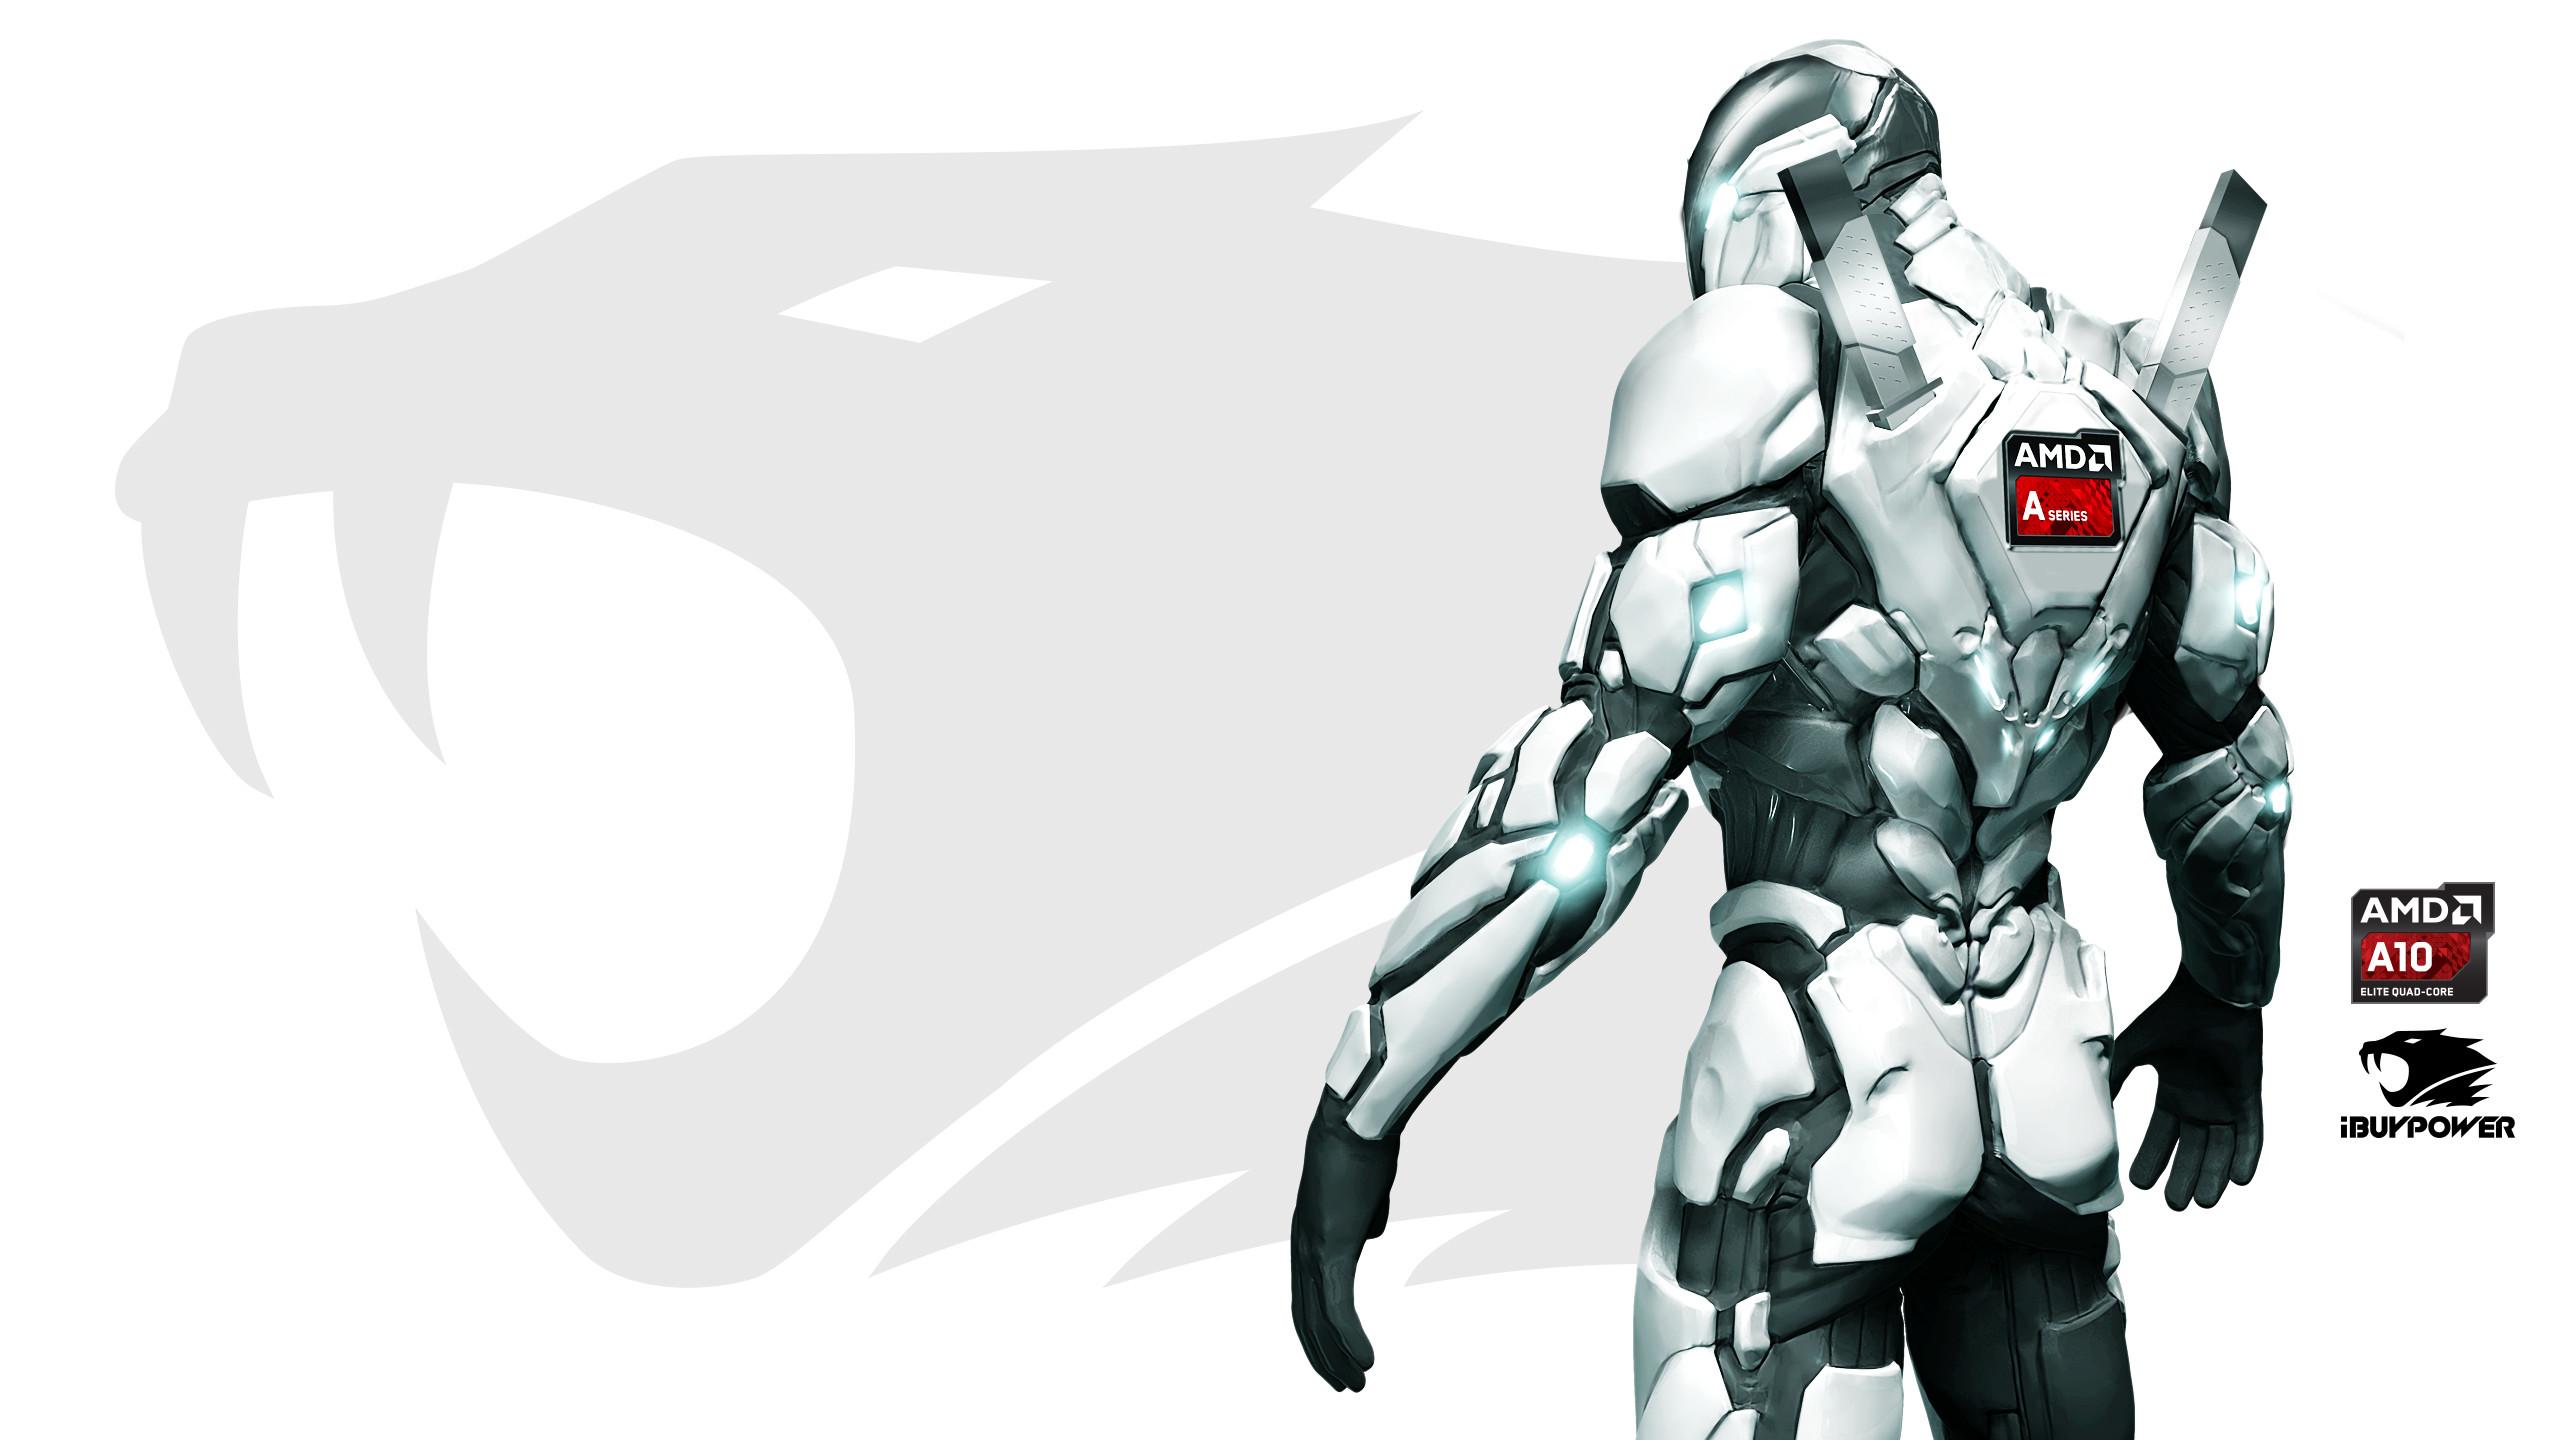 wallpaper.wiki-Cool-Amd-Fx-Gaming-Wallpaper-PIC-